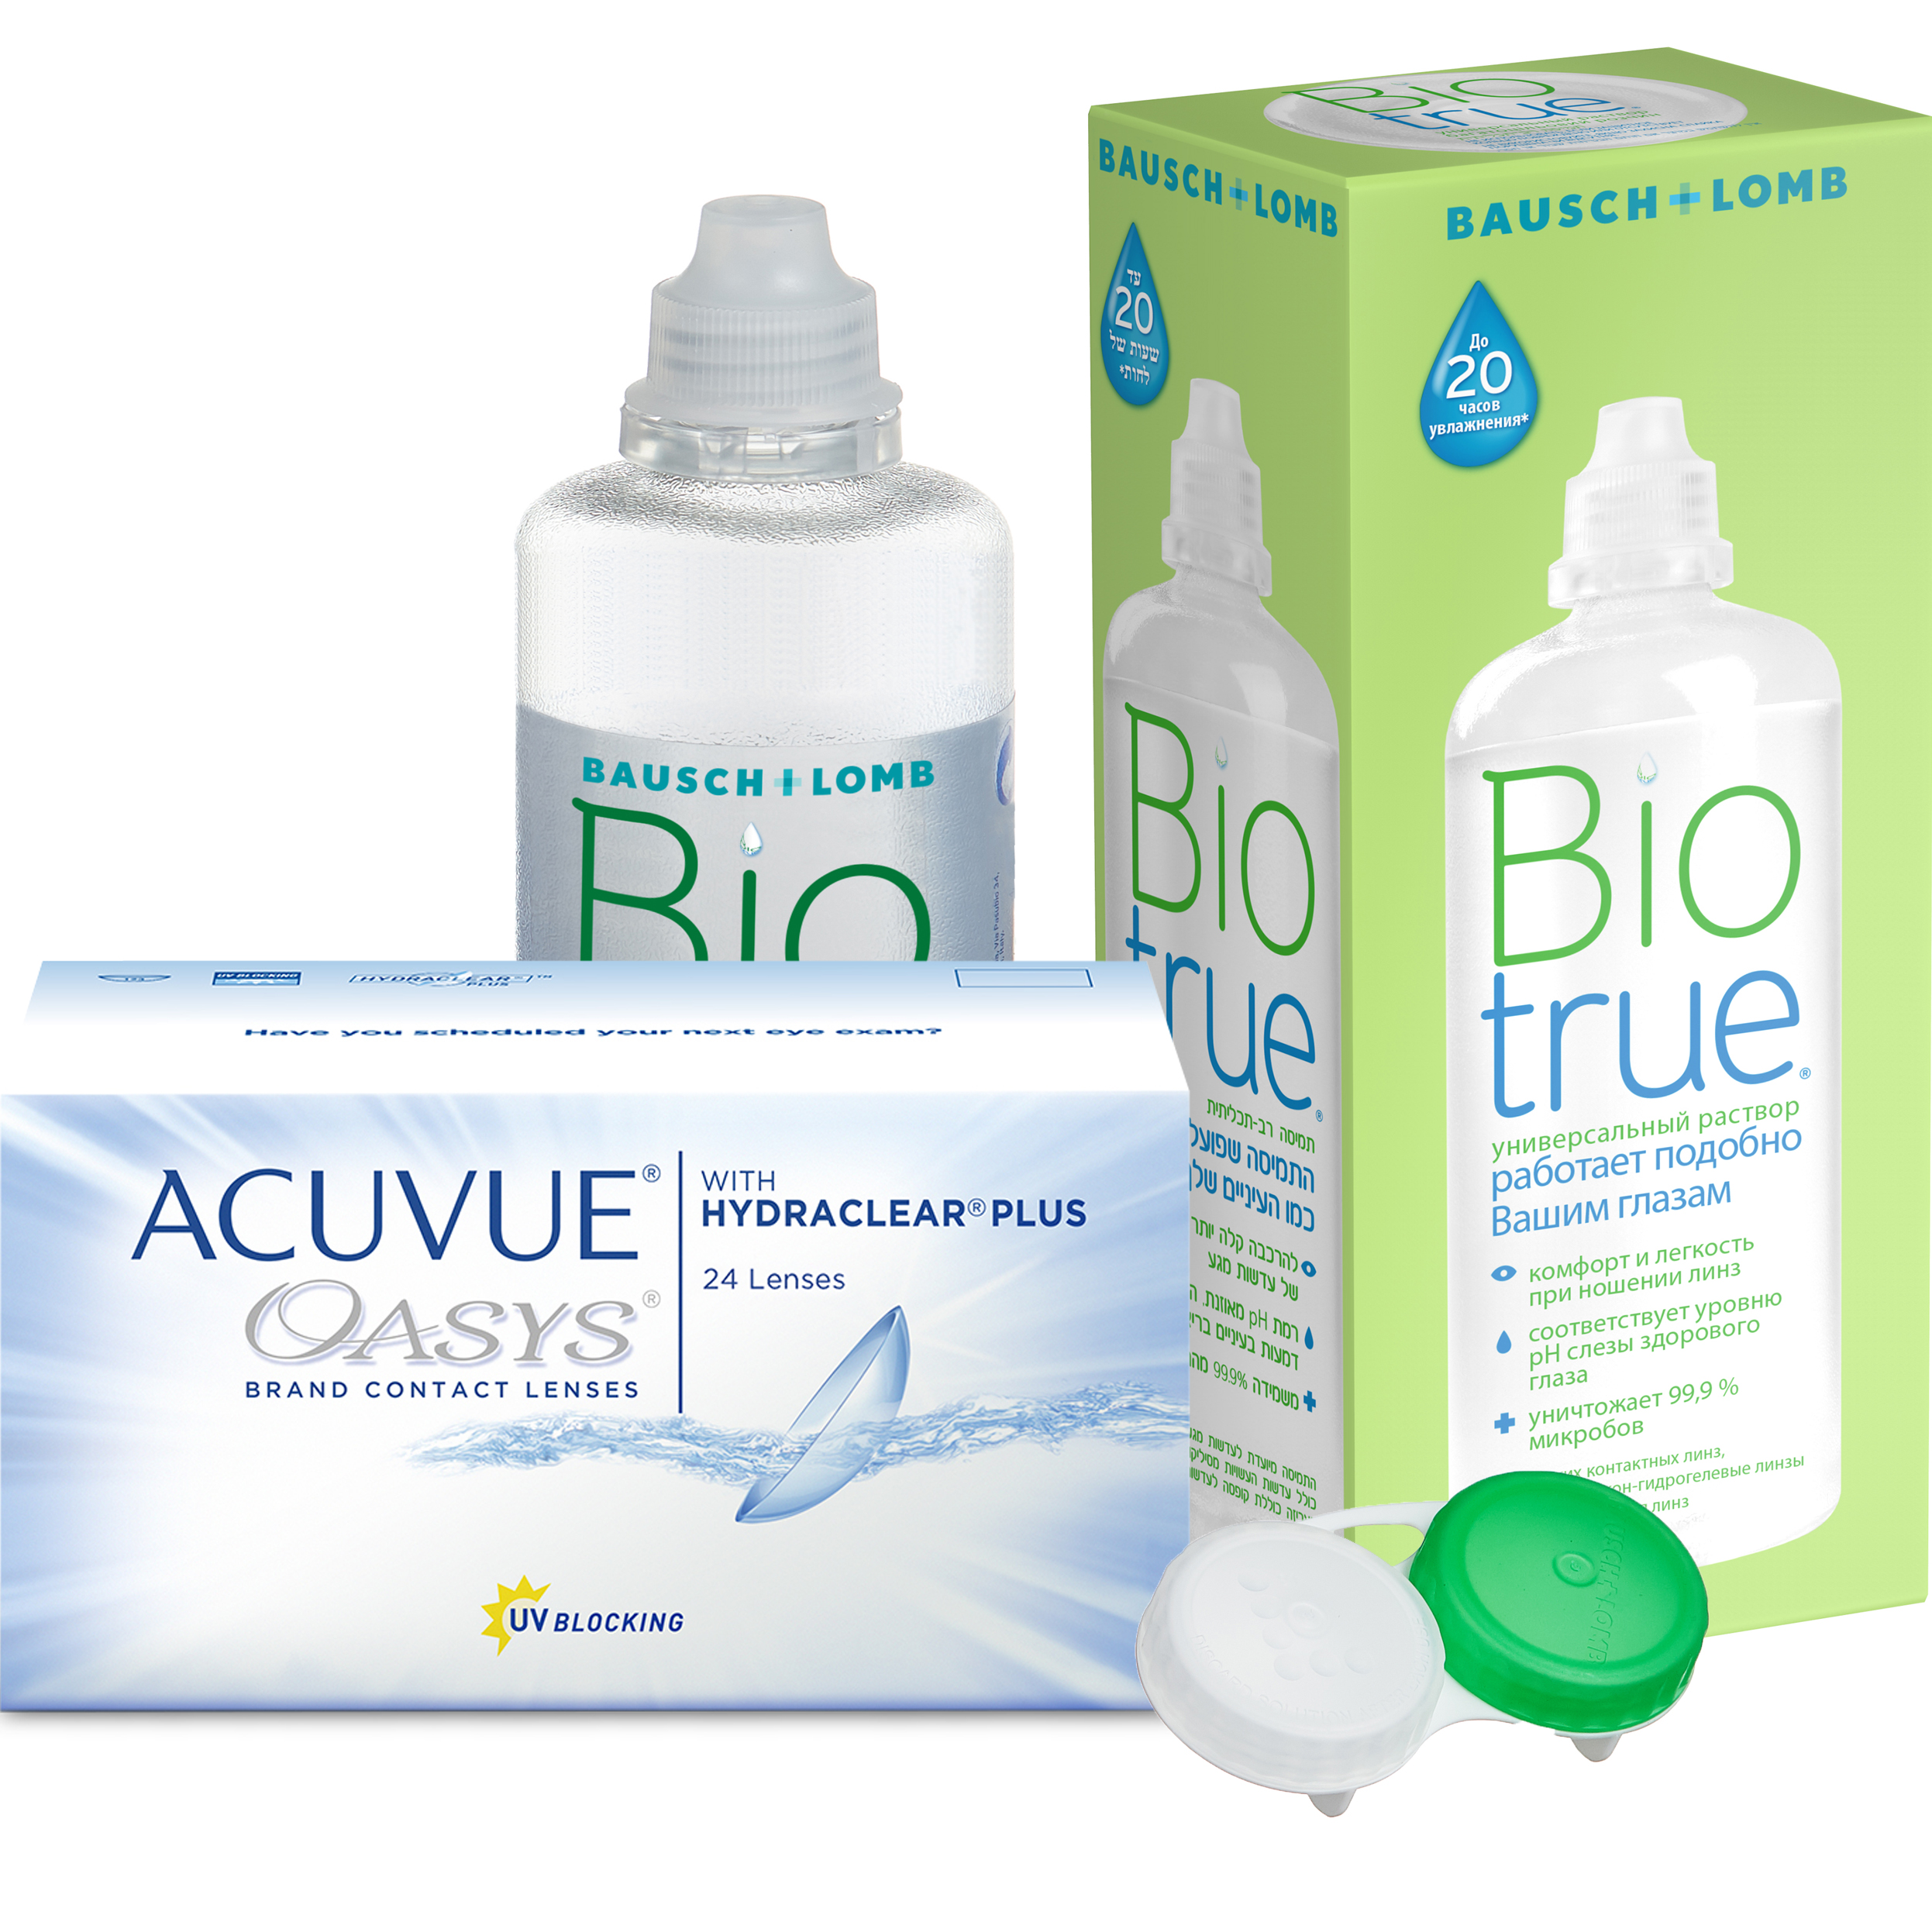 Купить Oasys with Hydraclear Plus 24 линзы + Biotrue, Контактные линзы Acuvue Oasys with Hydraclear Plus 24 линзы R 8.8 -5, 25 + Biotrue 300 мл